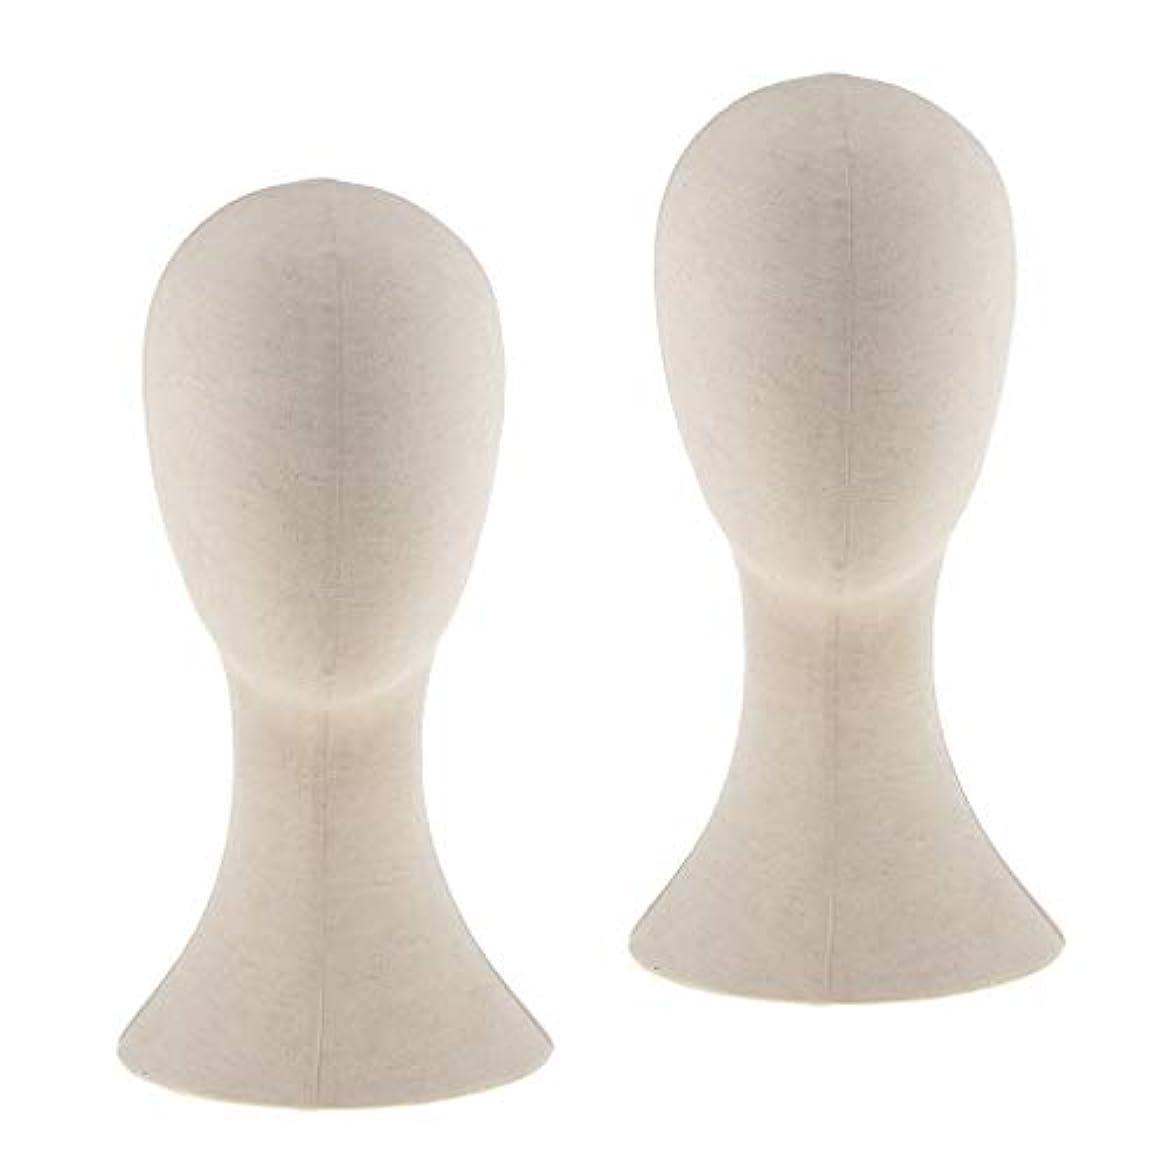 Perfeclan 2個入り マネキンヘッド トルソー 頭 カット練習 頭部 女性 ウィッグマネキン ウィッグスタンド